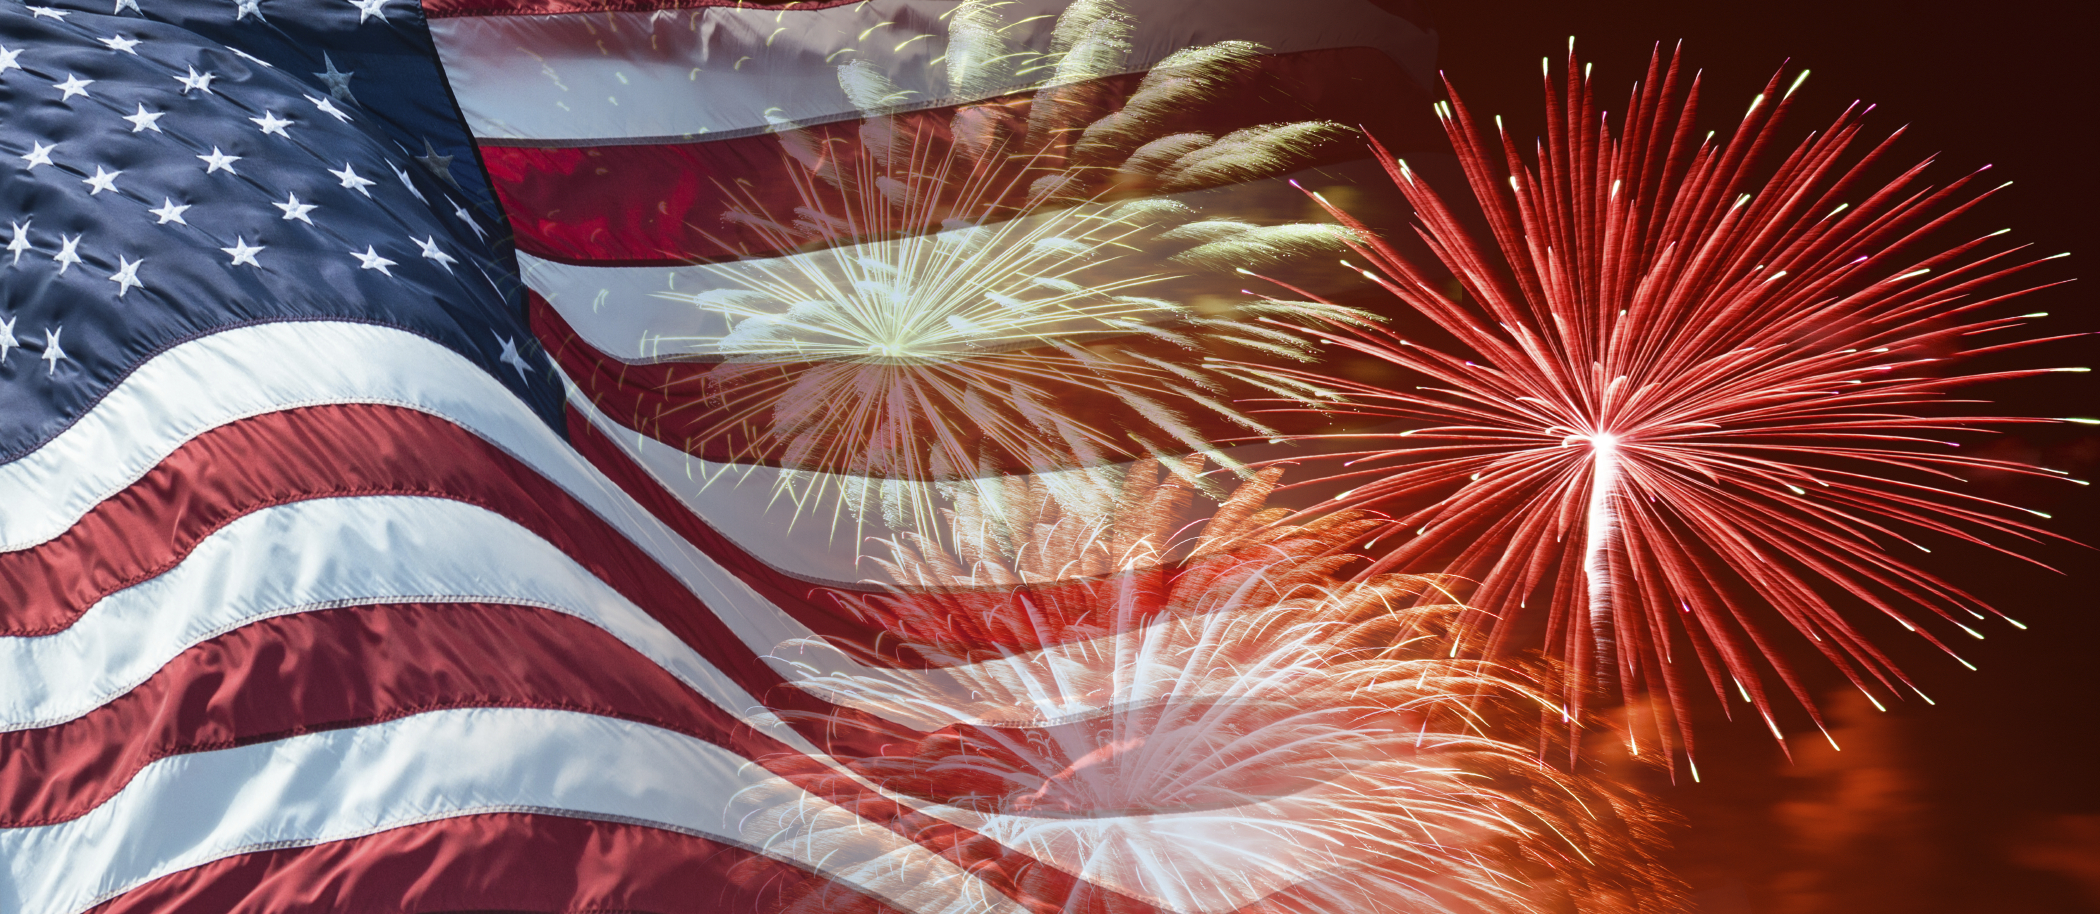 Fireworks and Flag stock image. Image of stars, stripes